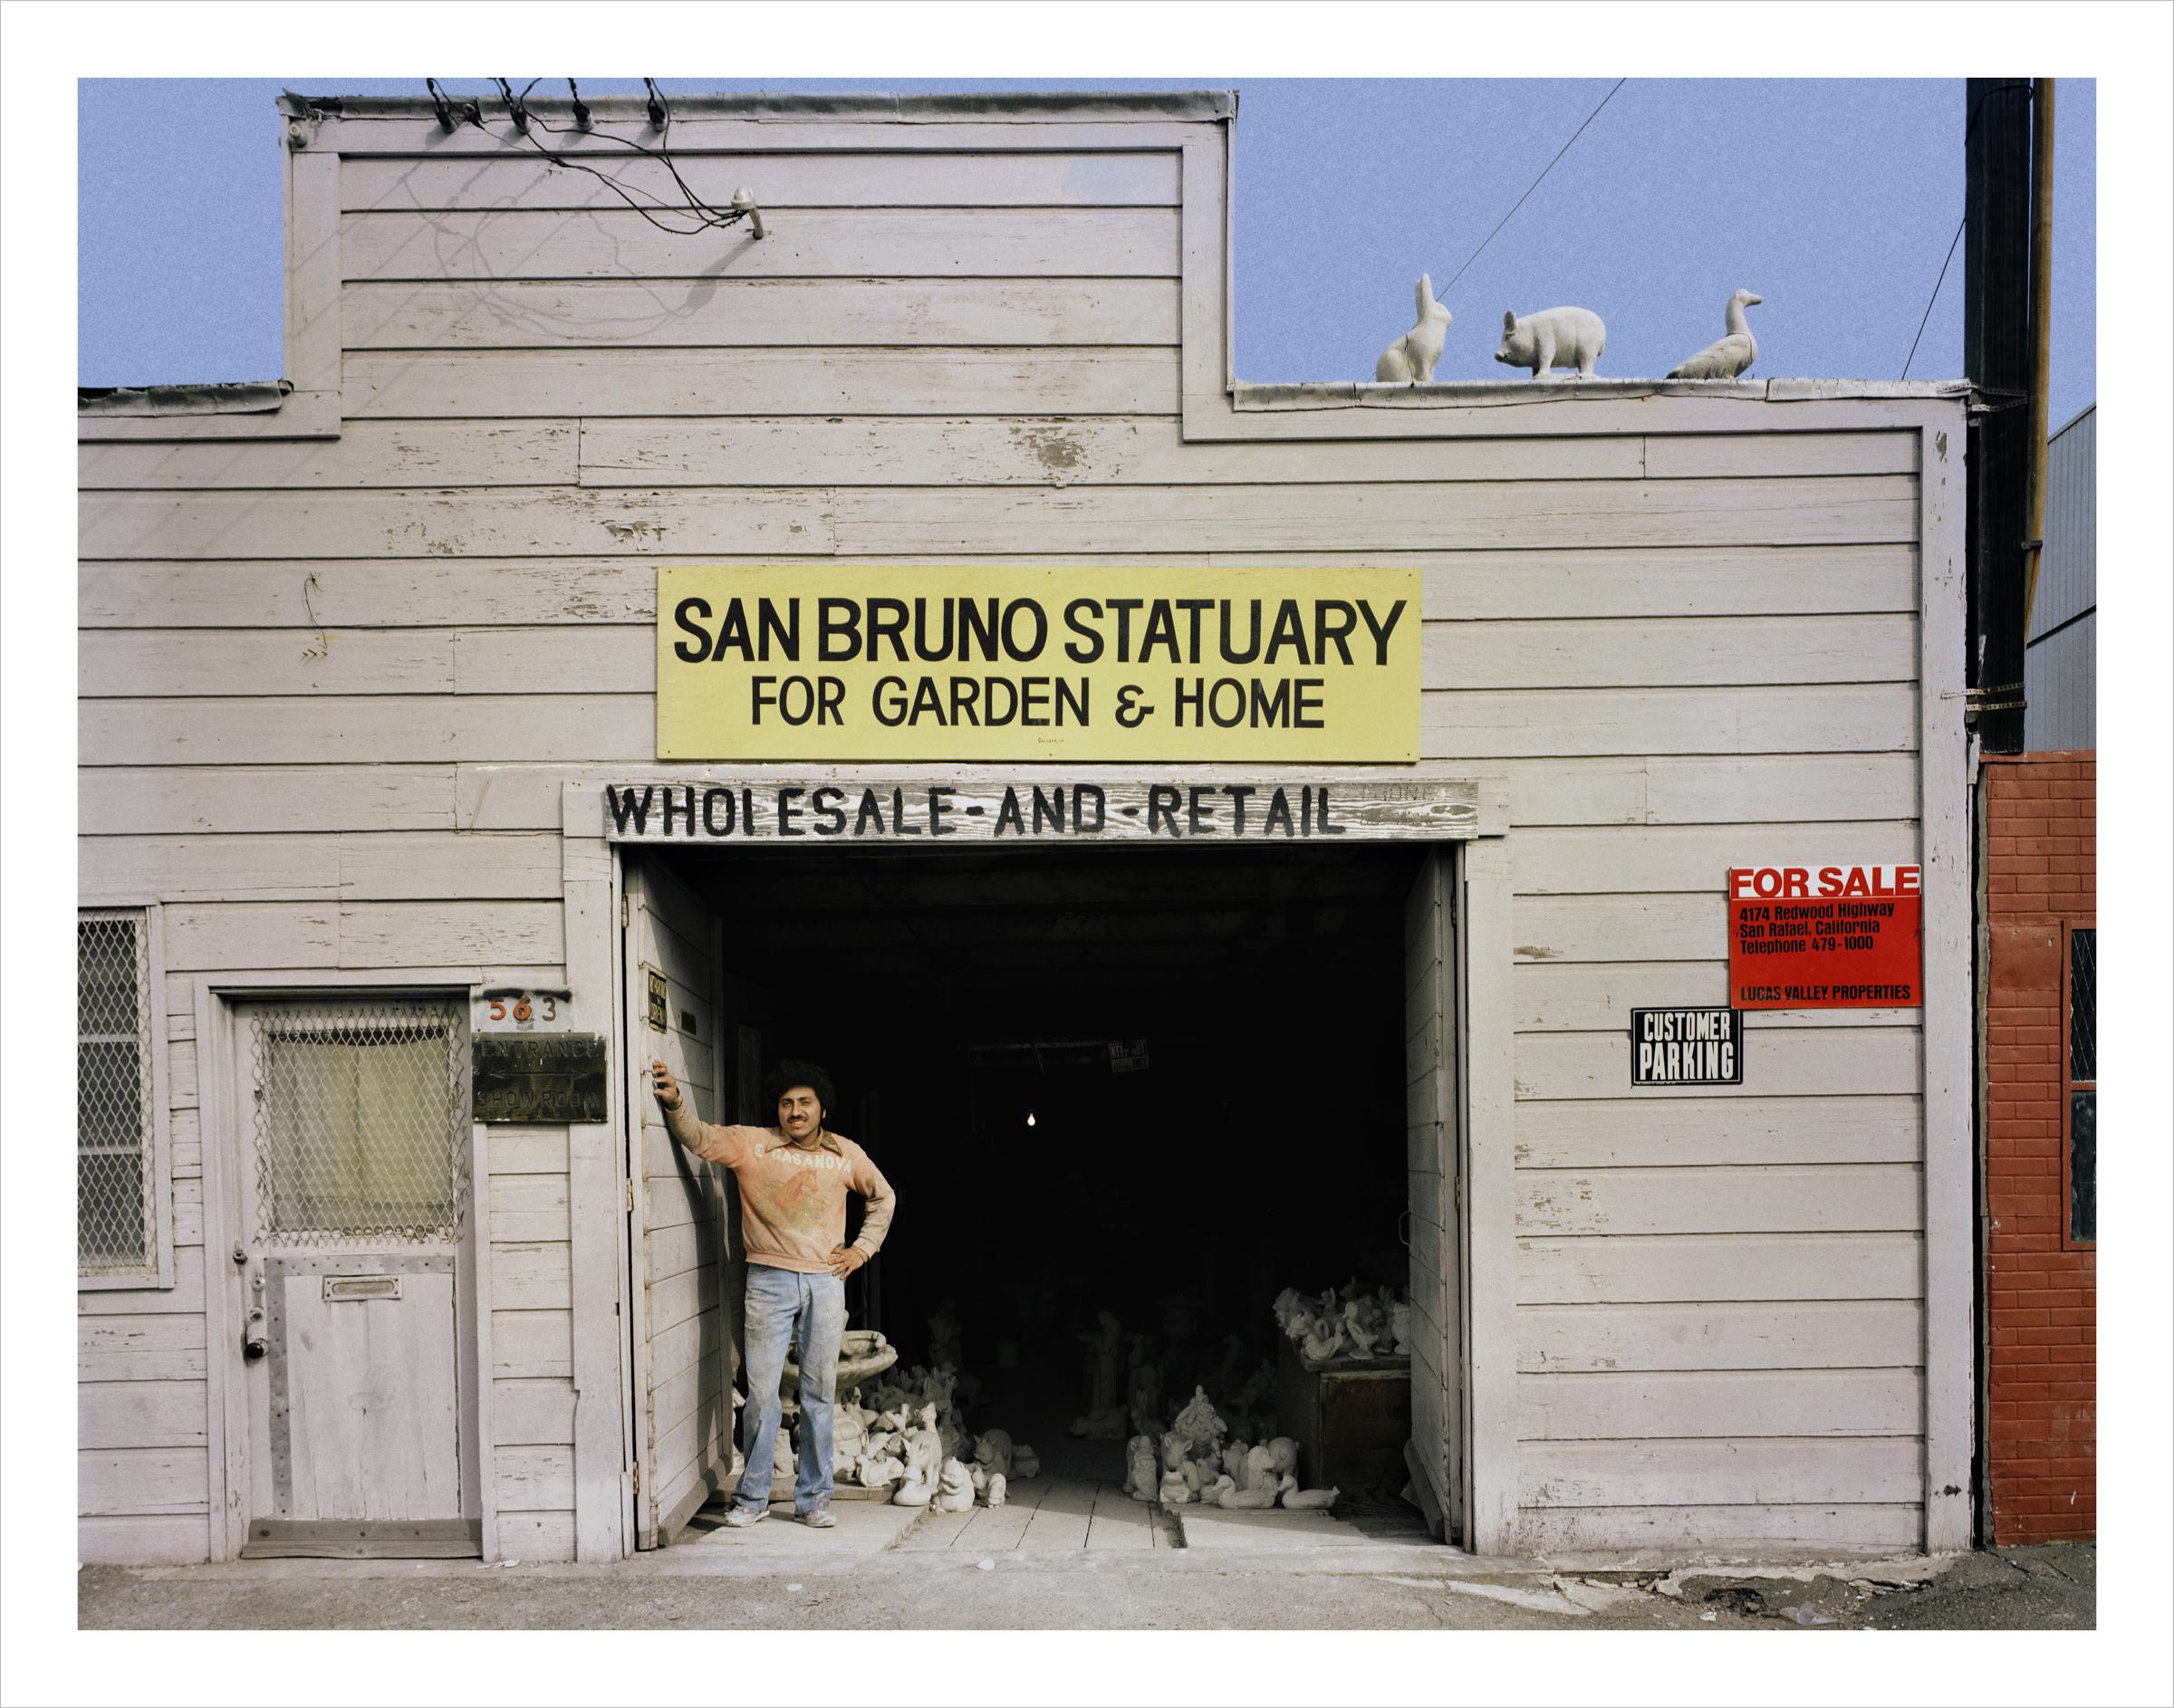 San Bruno Statuary, 563 6th Street, 1981 Archival Pigment Print, 2016 16 x 20 inches, edition of 5 20 x 24 inches, edition of 2 30 x 40 inches, edition of 2